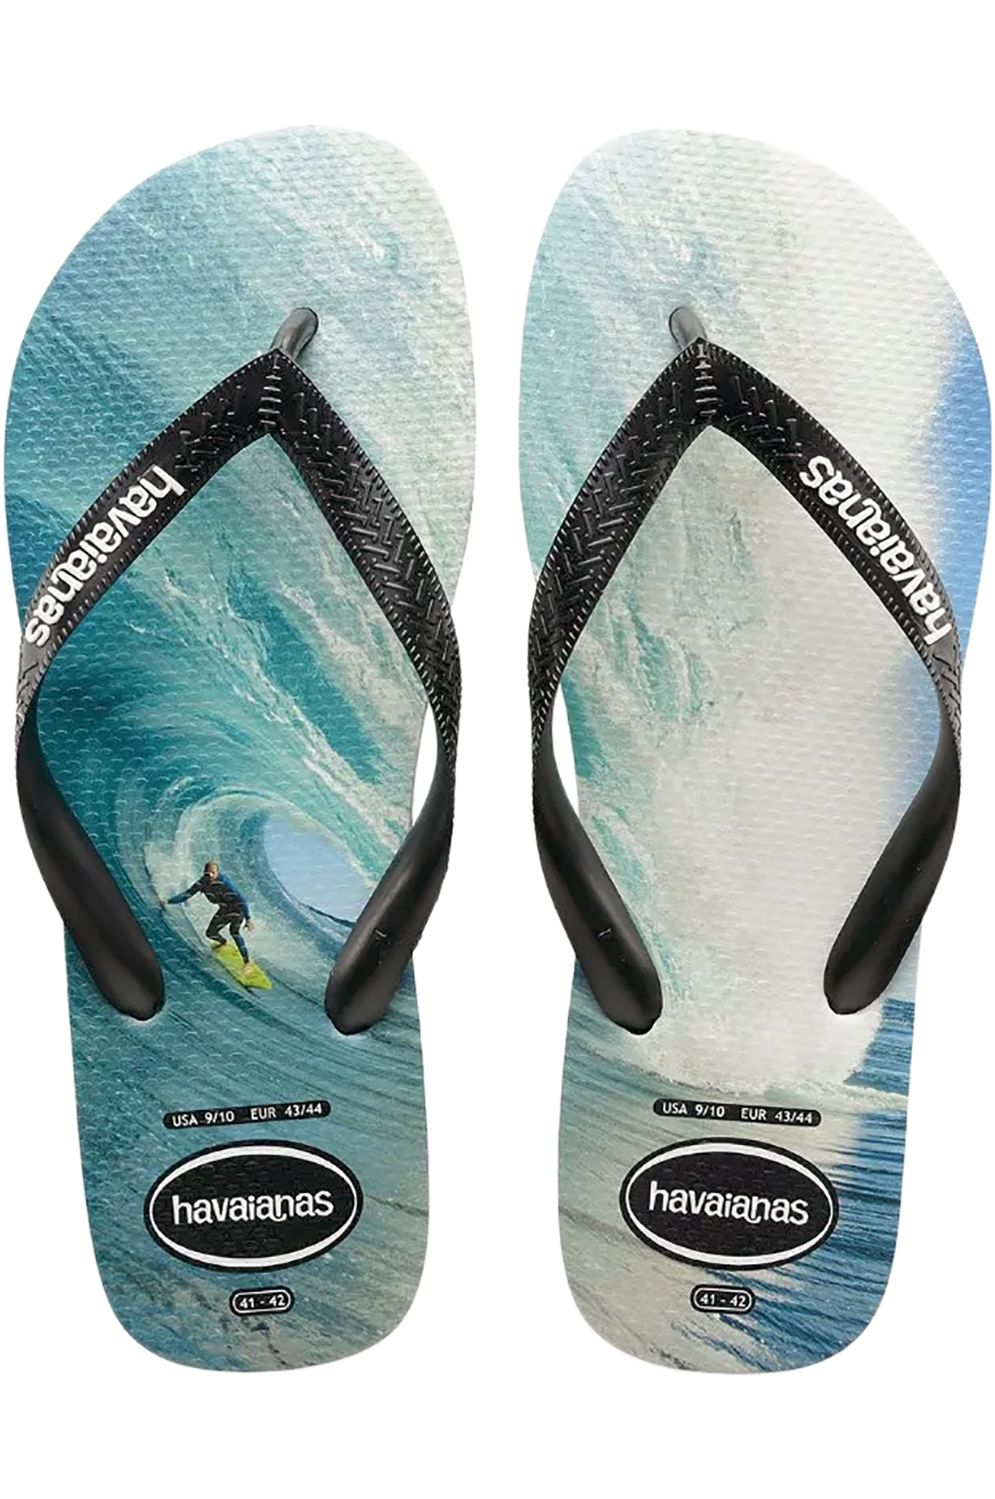 Havaianas Sandals TOP PHOTOPRINT Black/Black/Blue